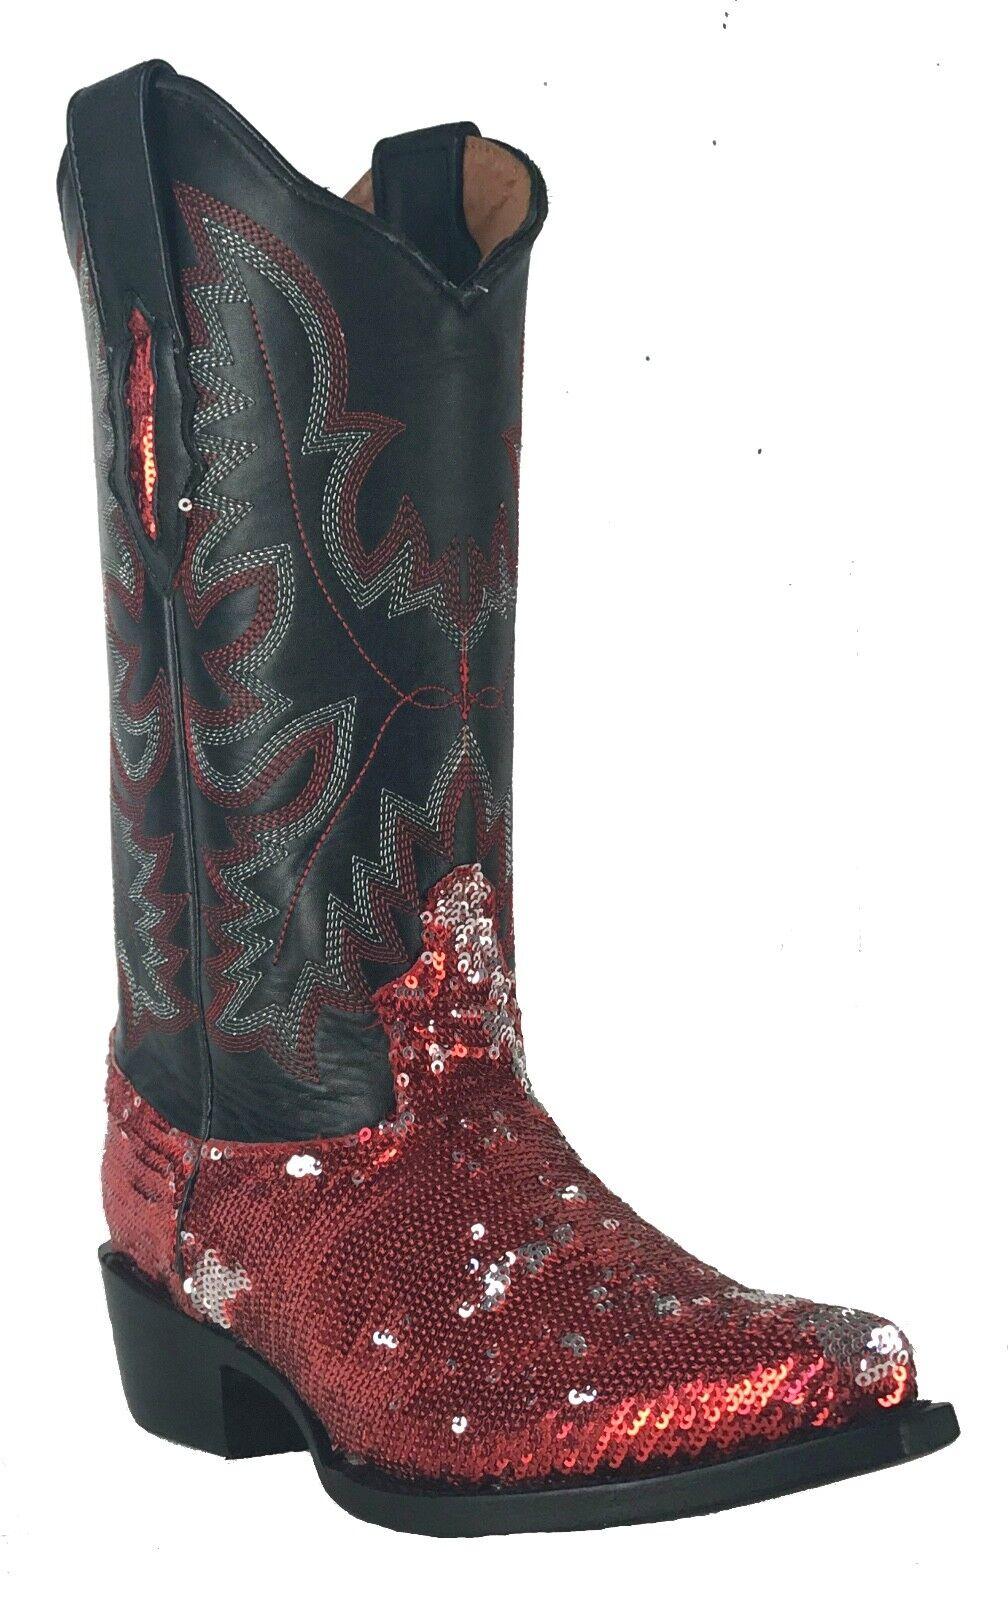 Women's Fantastical Shimmering Sequin Western Cowgirl Biker Boots Snip Red